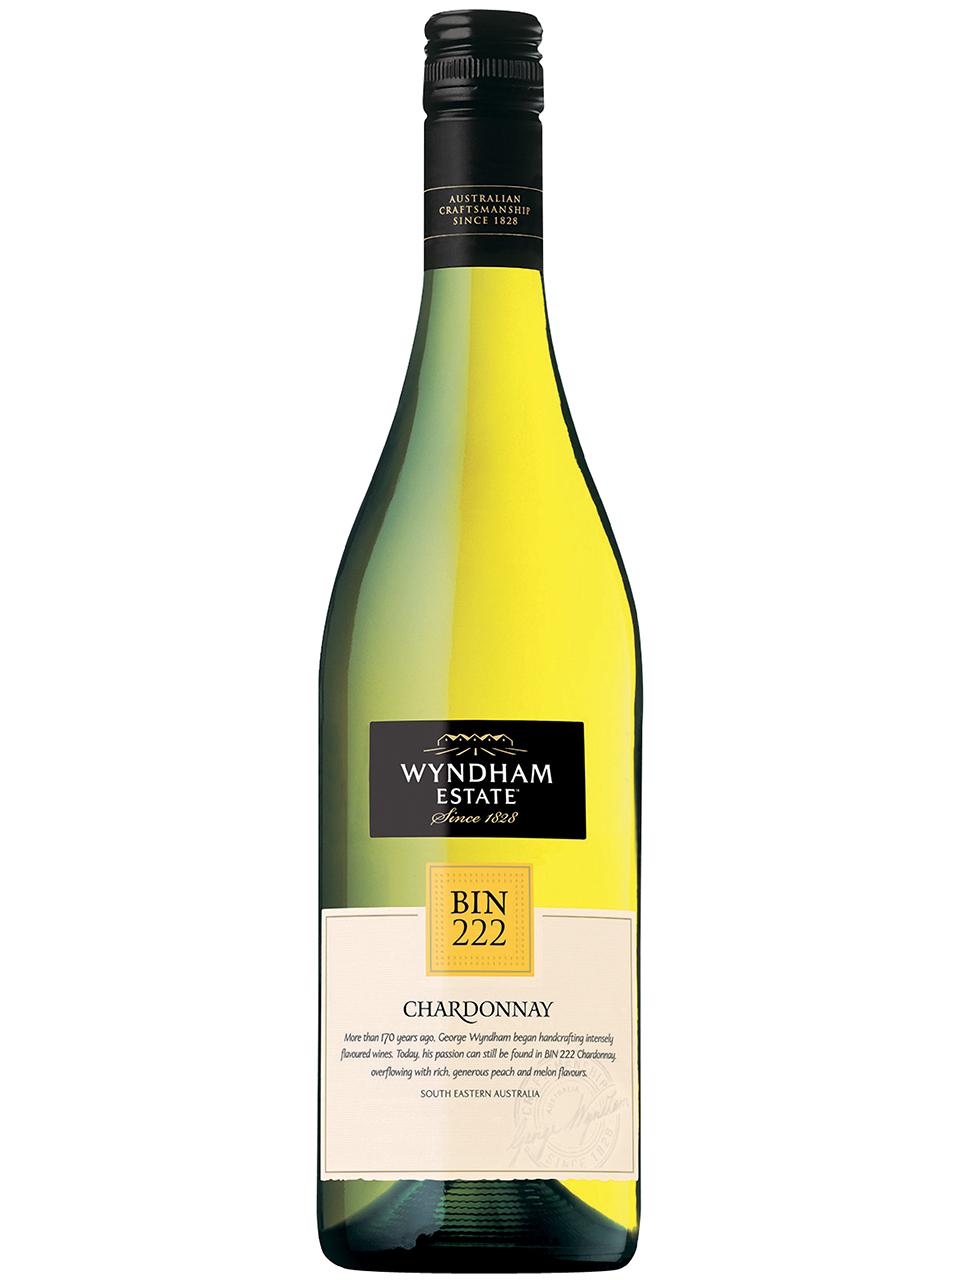 Wyndham Estate Bin 222 Chardonnay